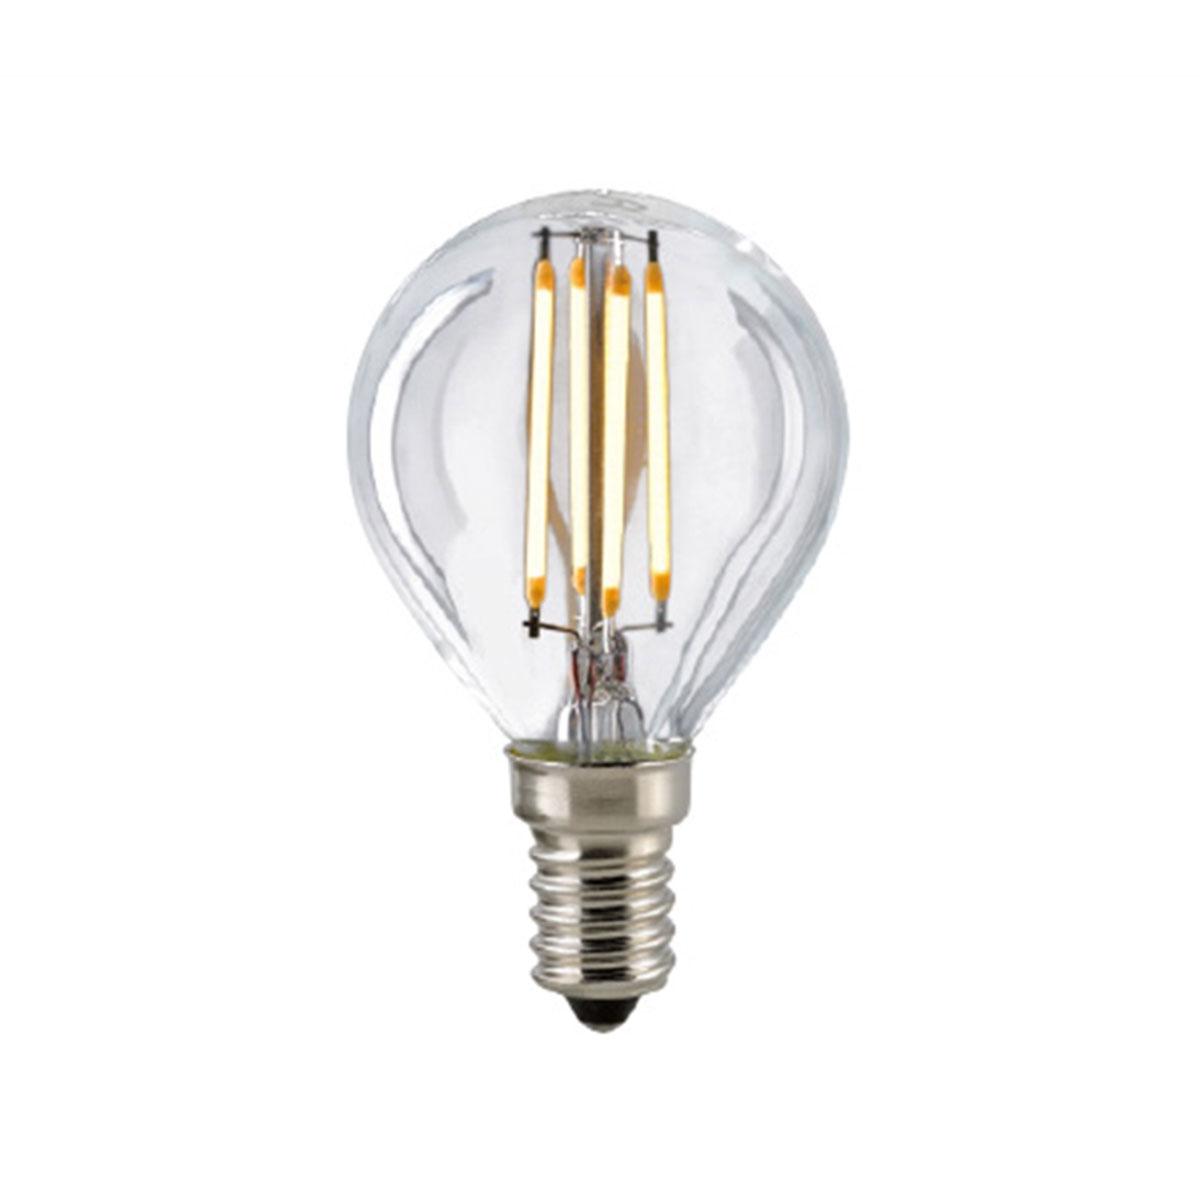 sigor led filament kugellampe e14 5 w warmwei dimmbar. Black Bedroom Furniture Sets. Home Design Ideas